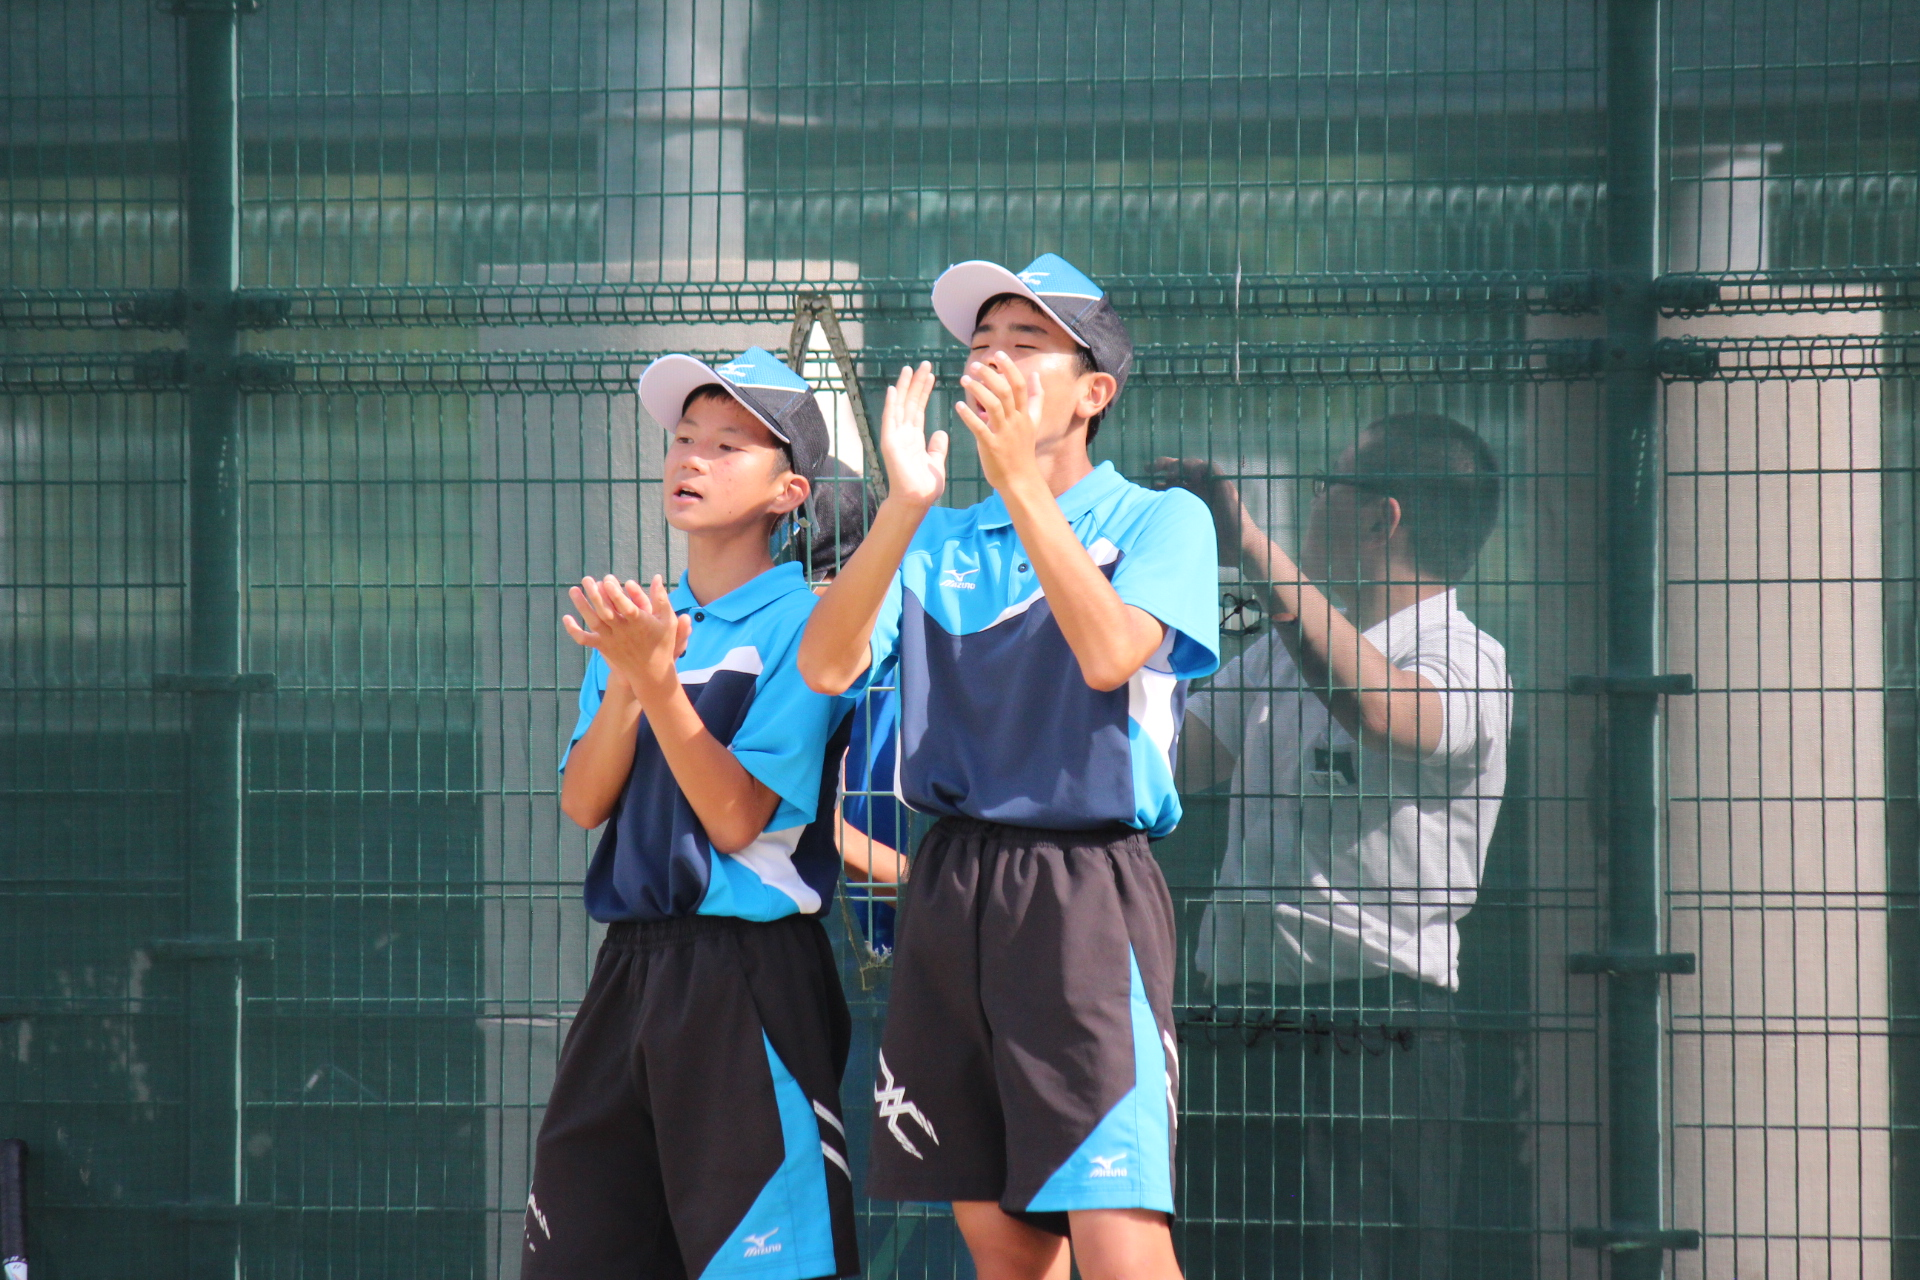 Tennis (80)